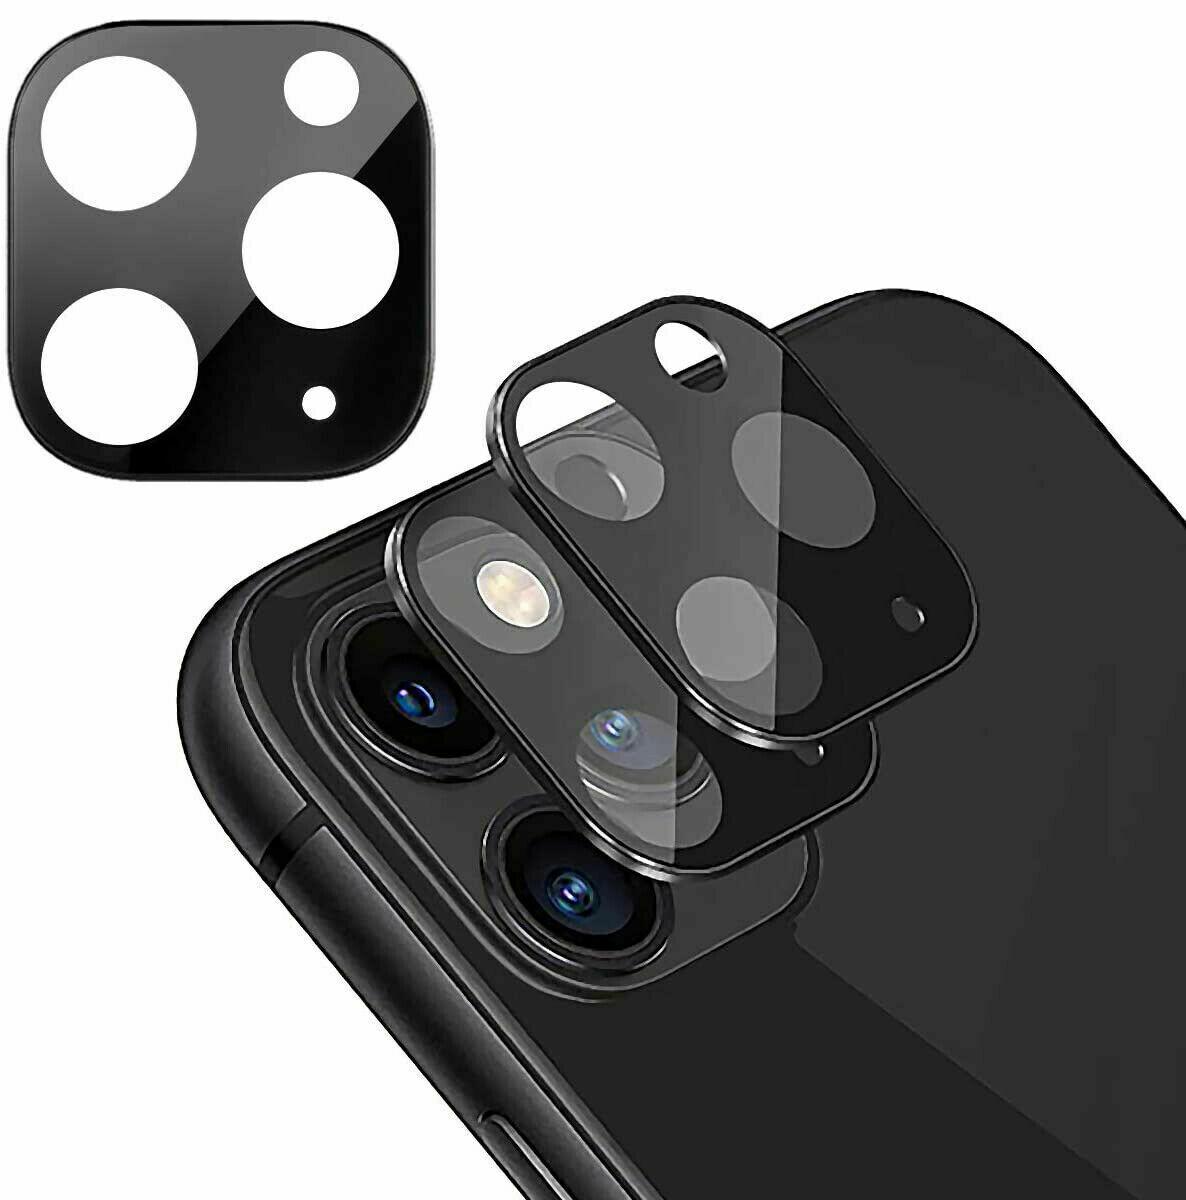 Kamera Schutz iPhone 11 / 11 Pro / 11 Pro Max Glas Metall Linsen